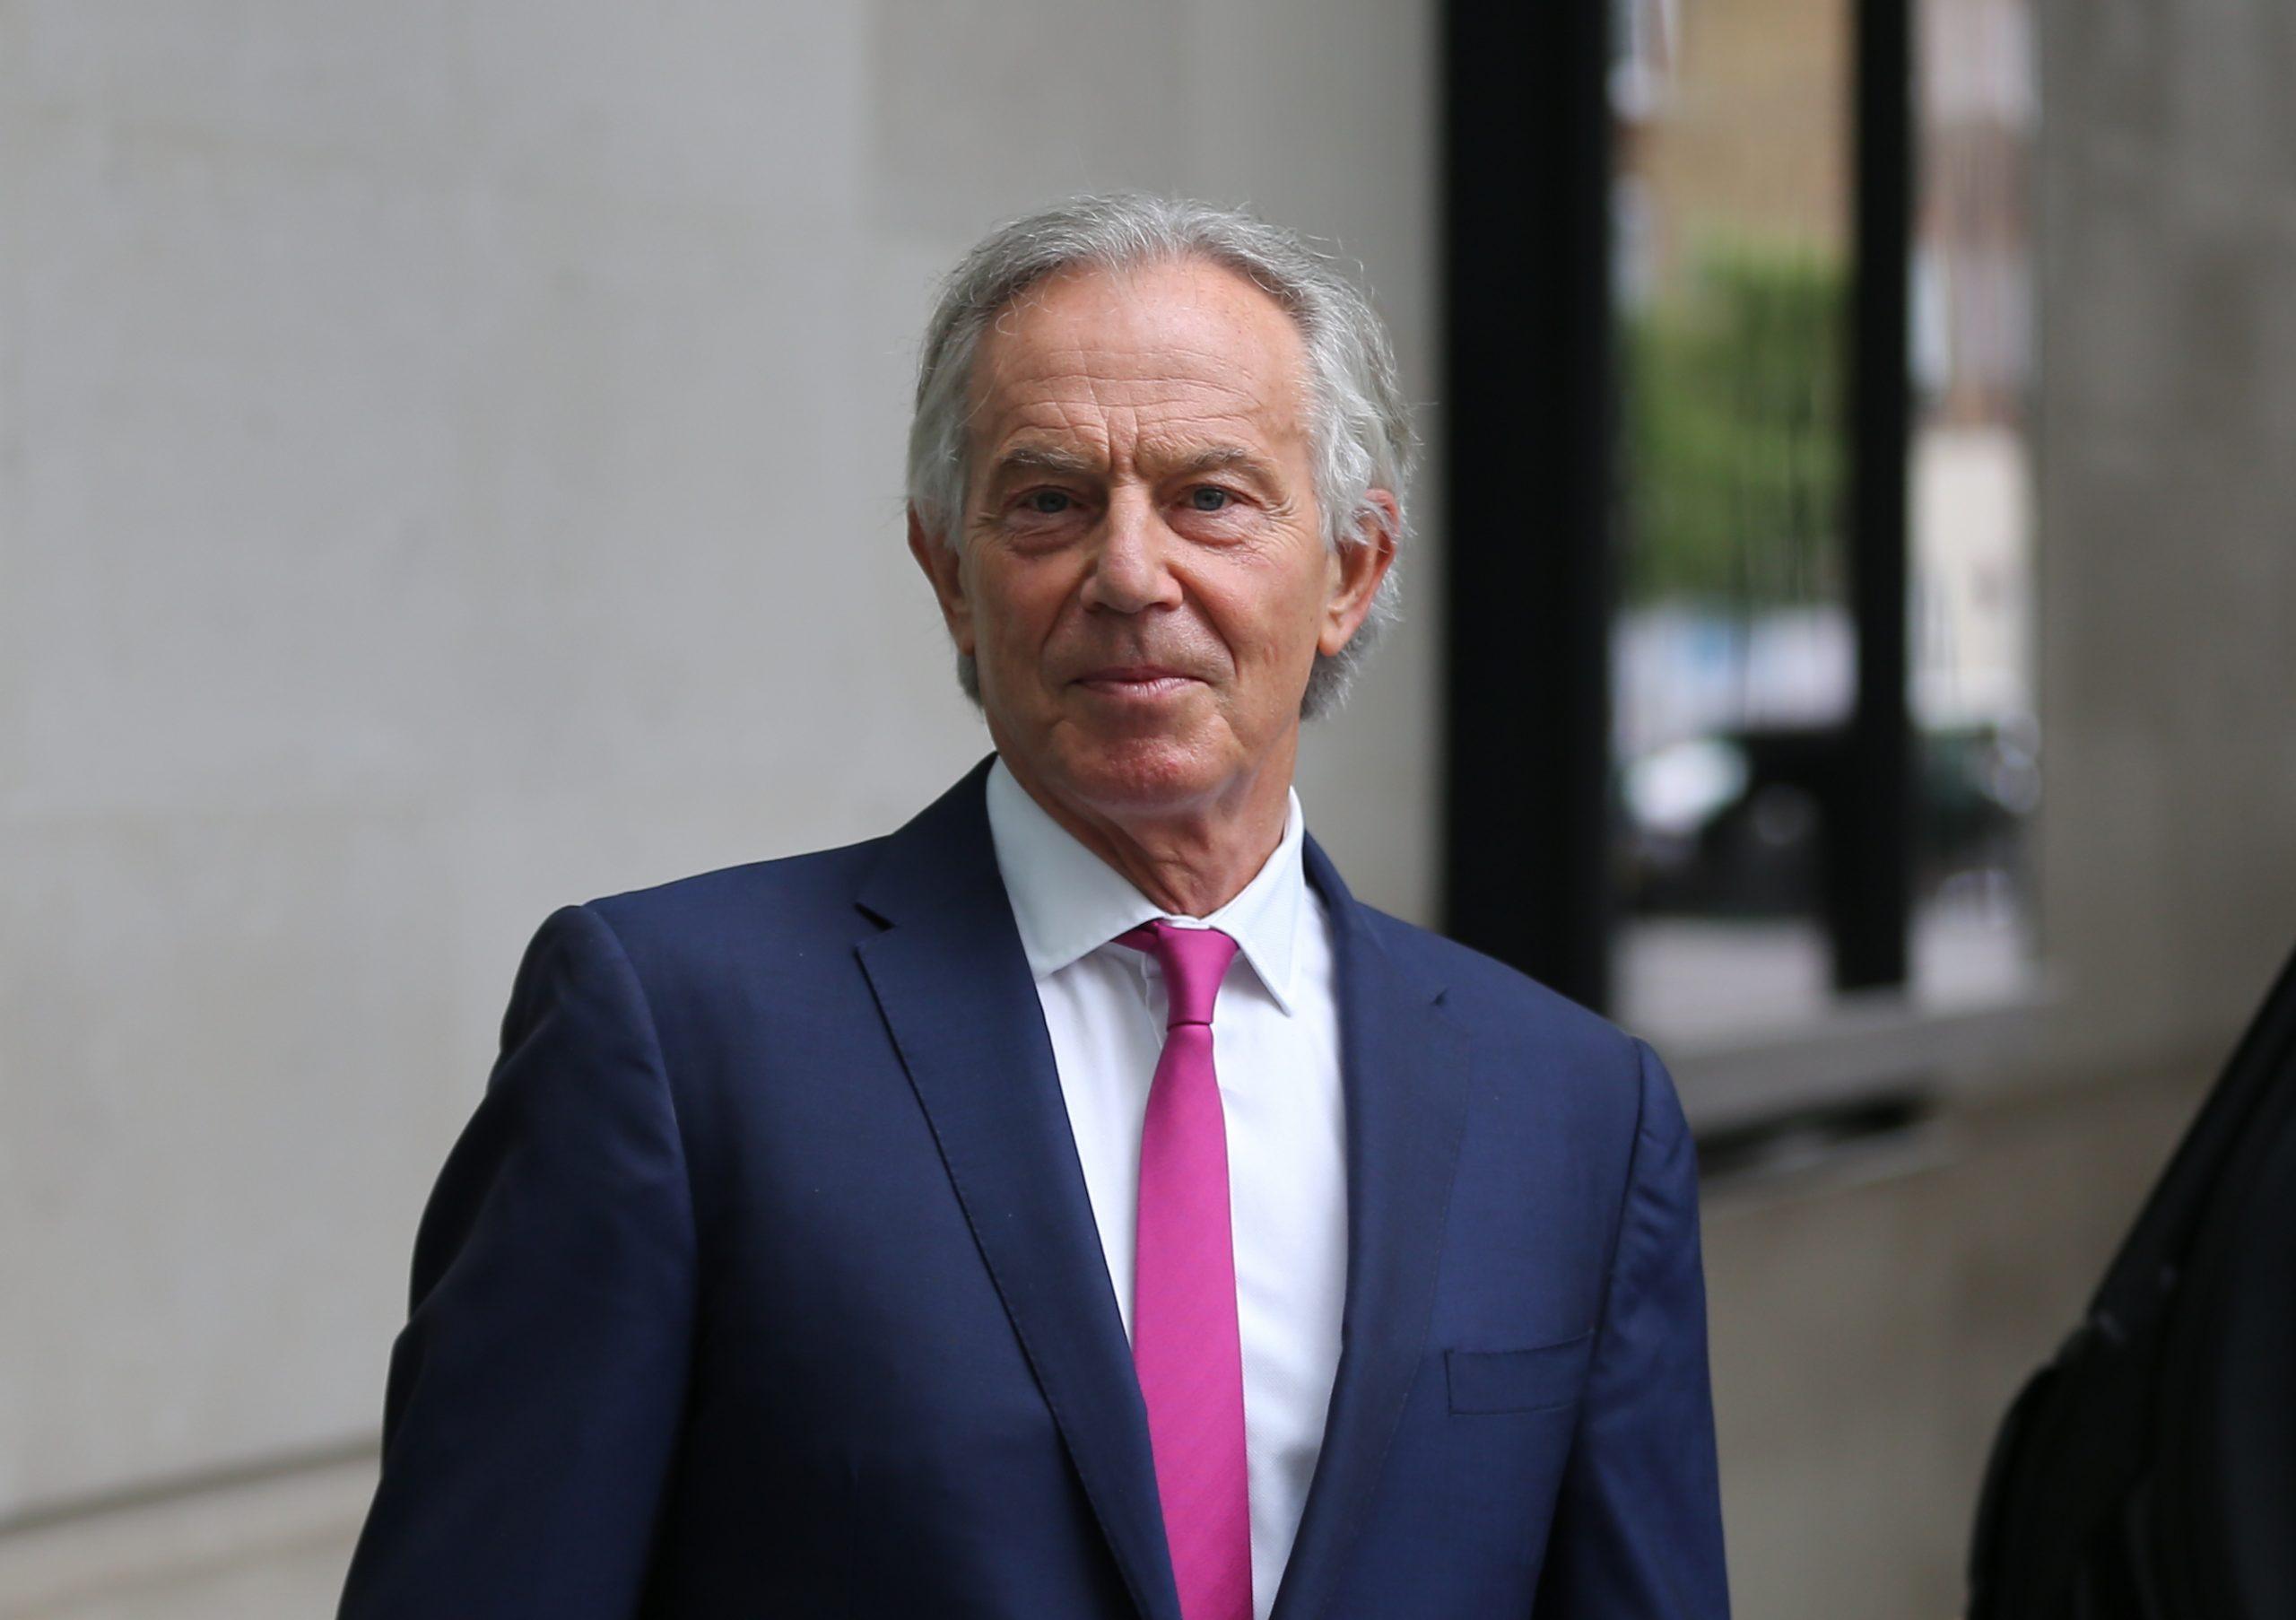 'Radical Islam' still a first-order security threat, says Blair